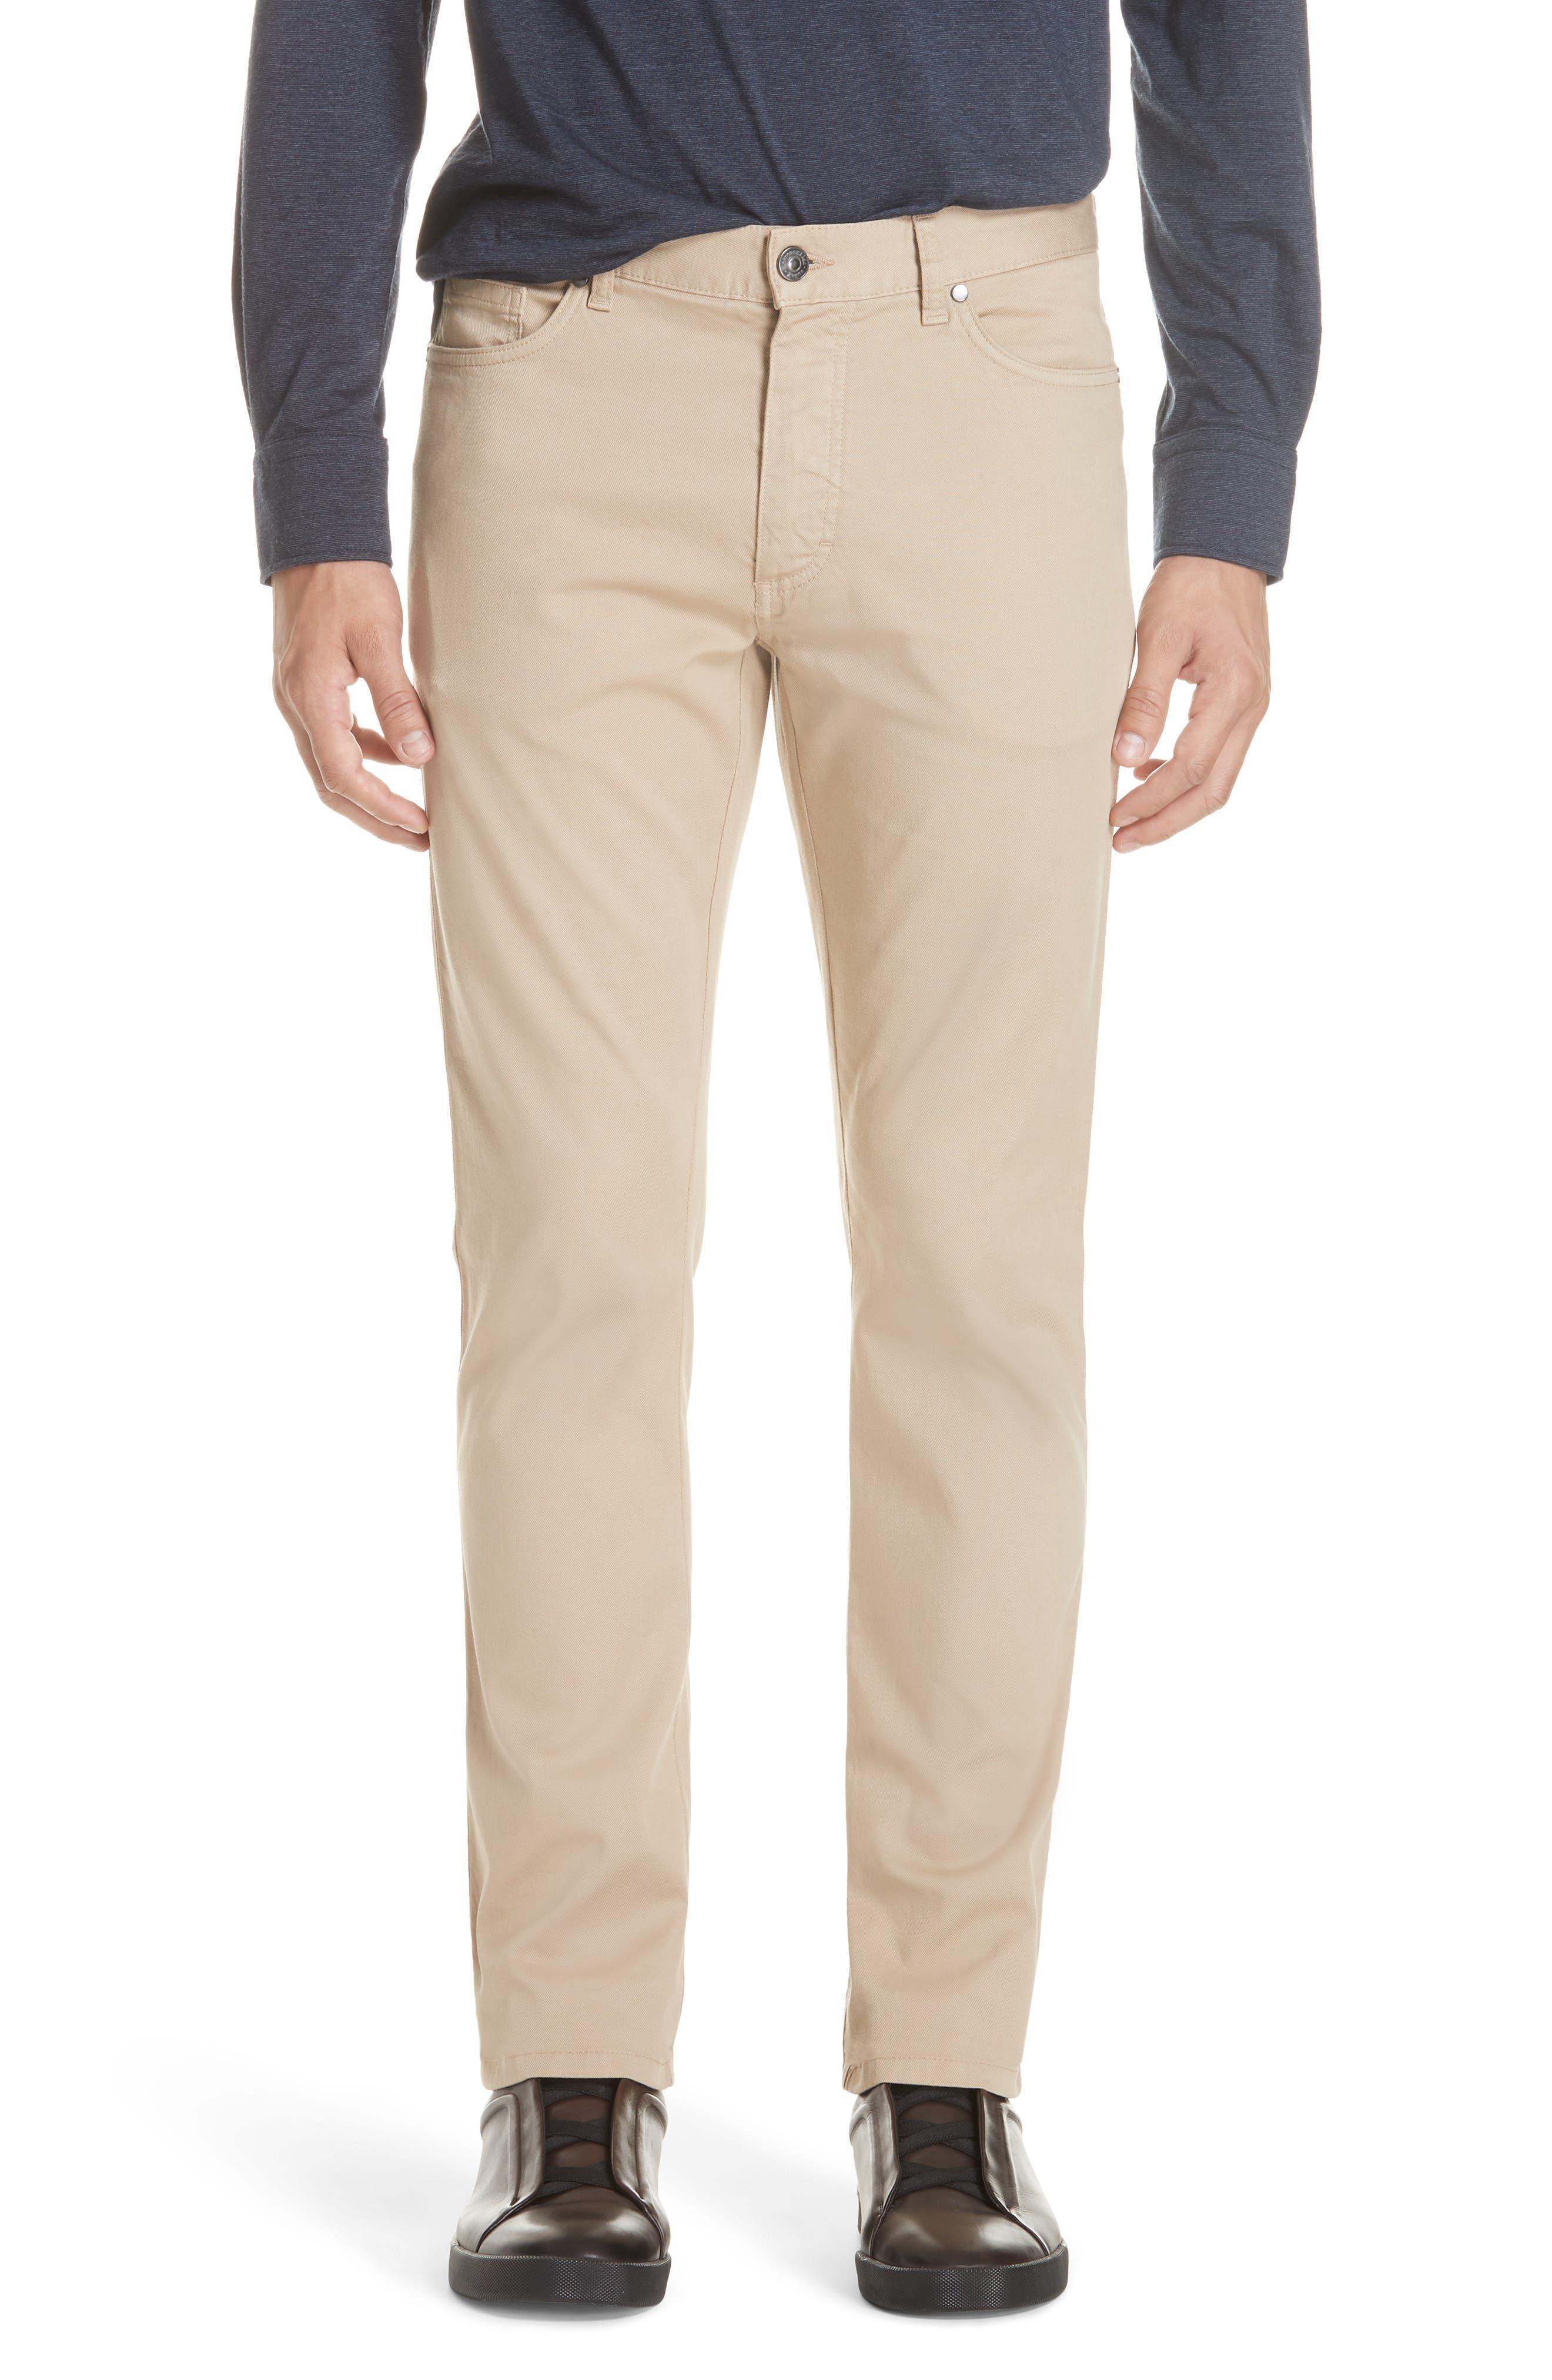 Men'S Cotton Canvas Straight-Leg Pants in Light Beige